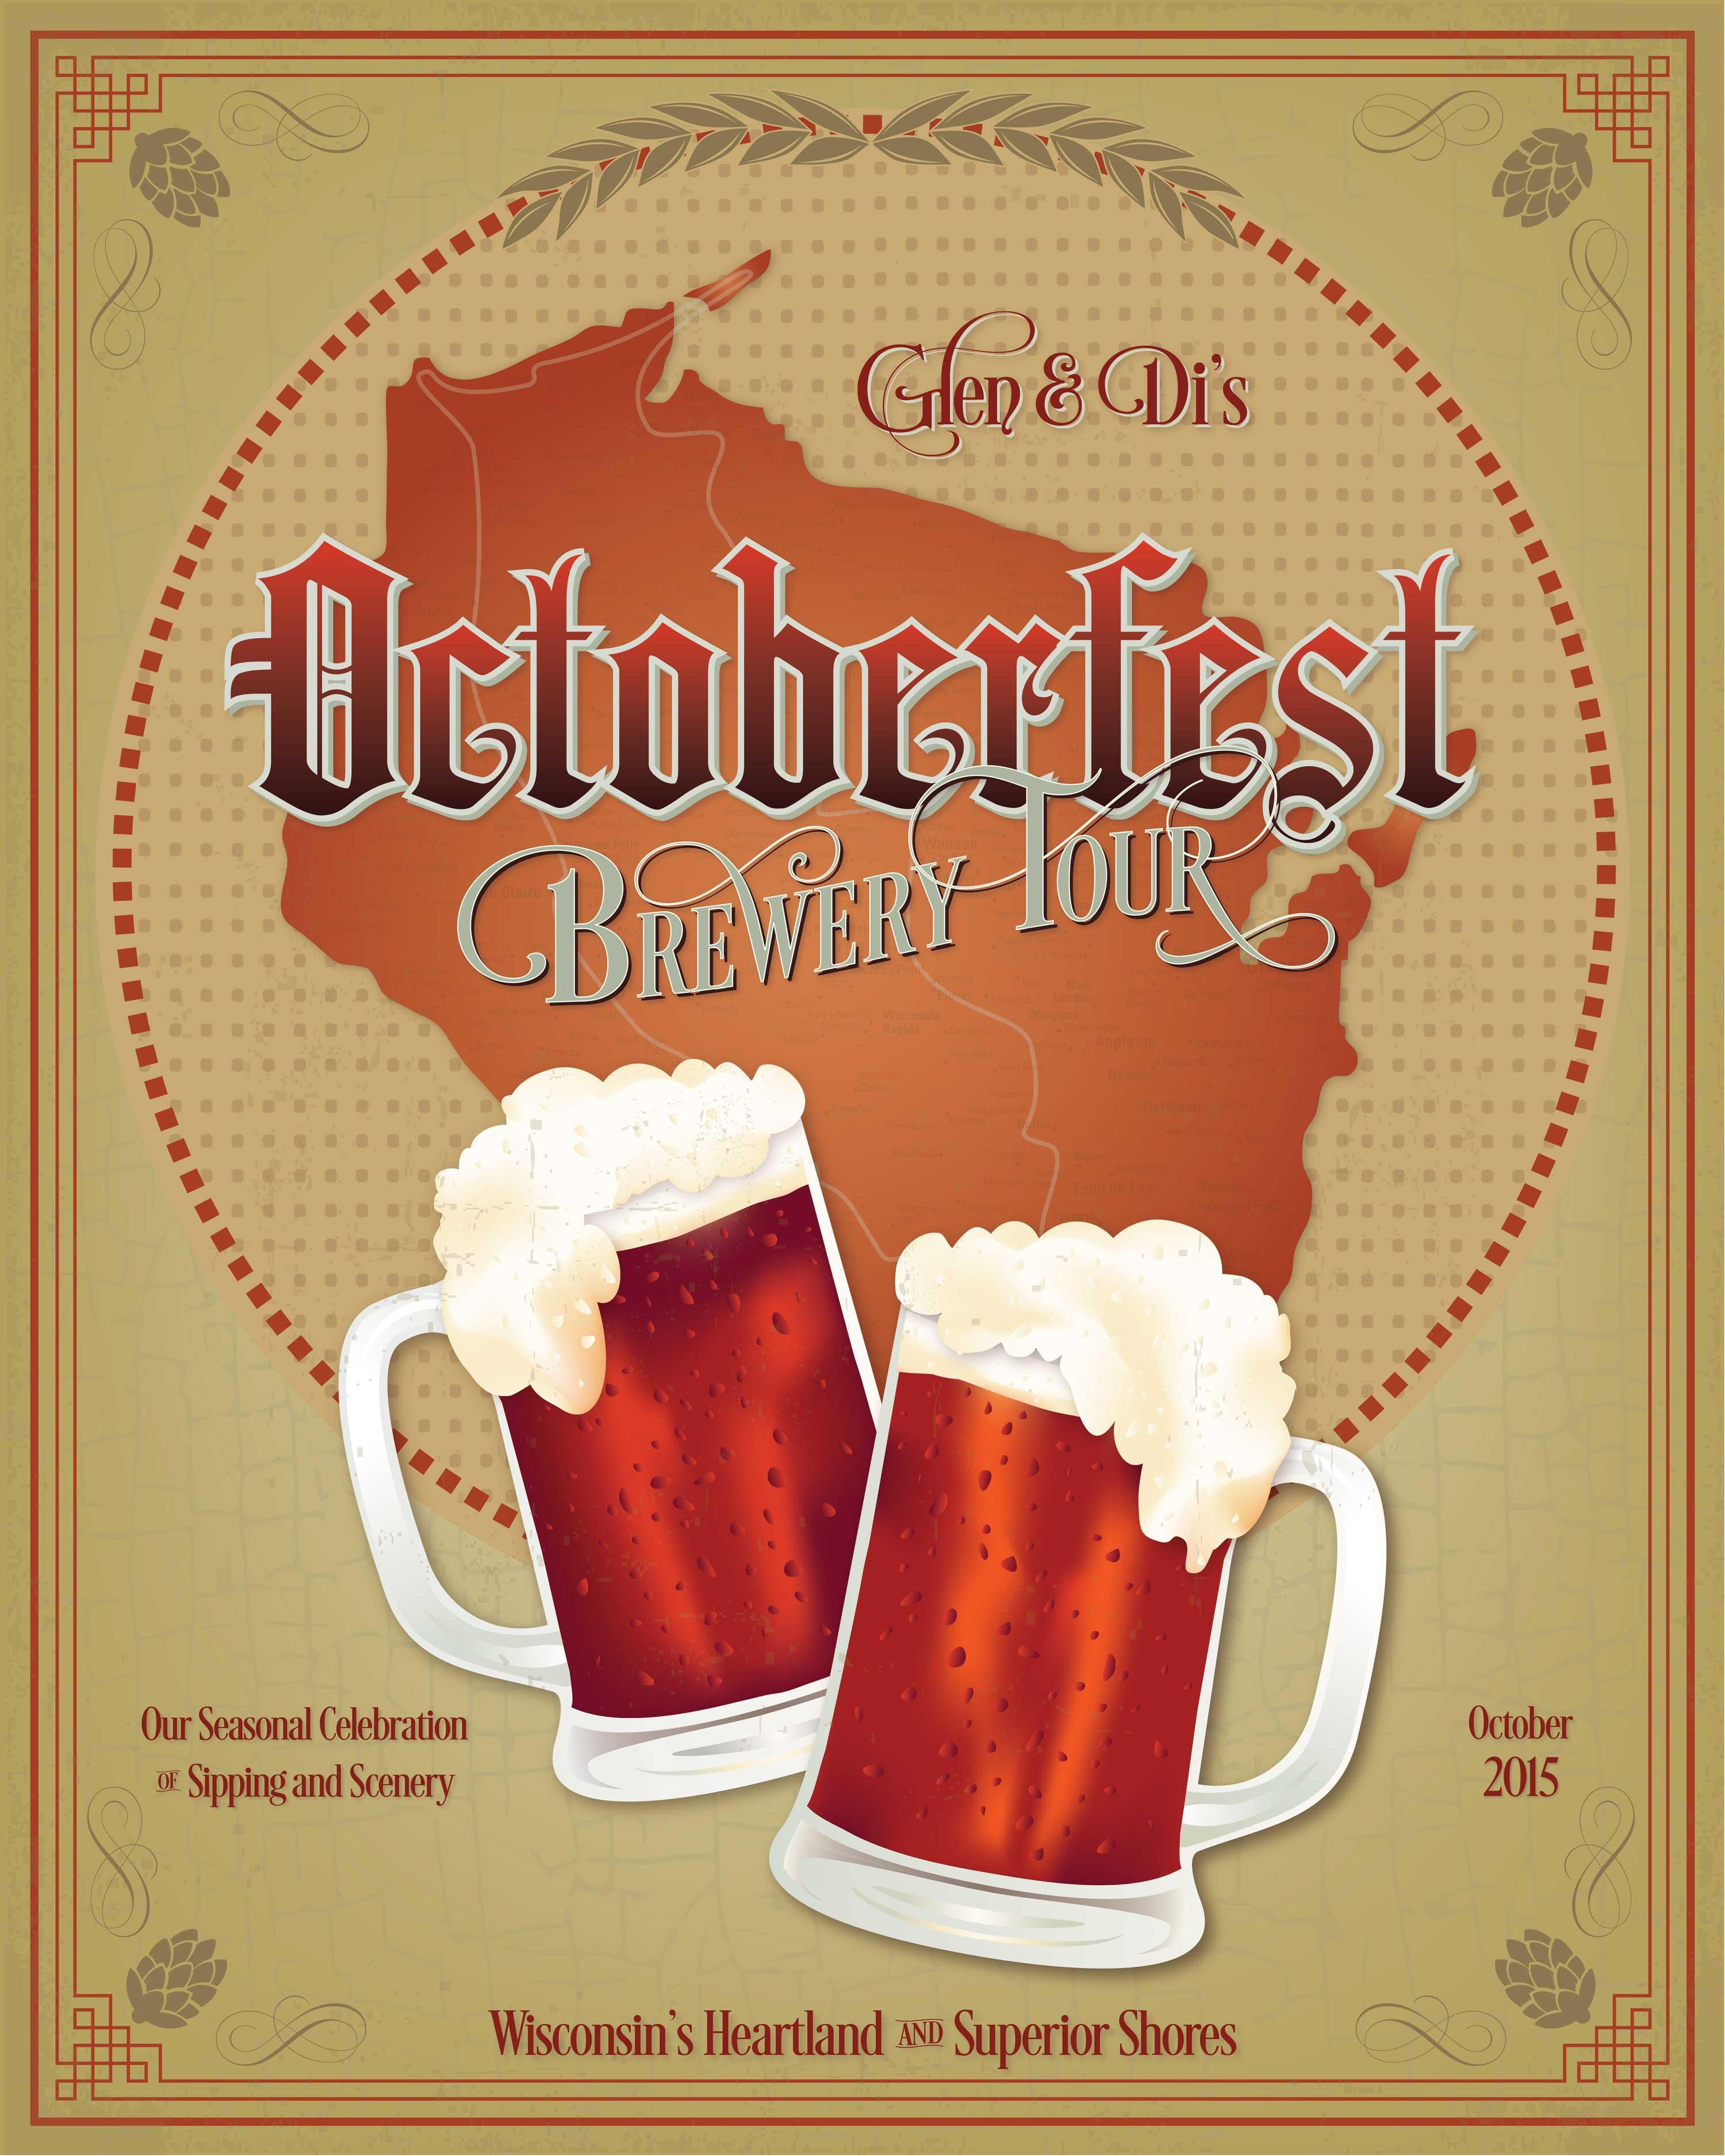 Octoberfest Beer Poster by Adunate, Oktoberfest